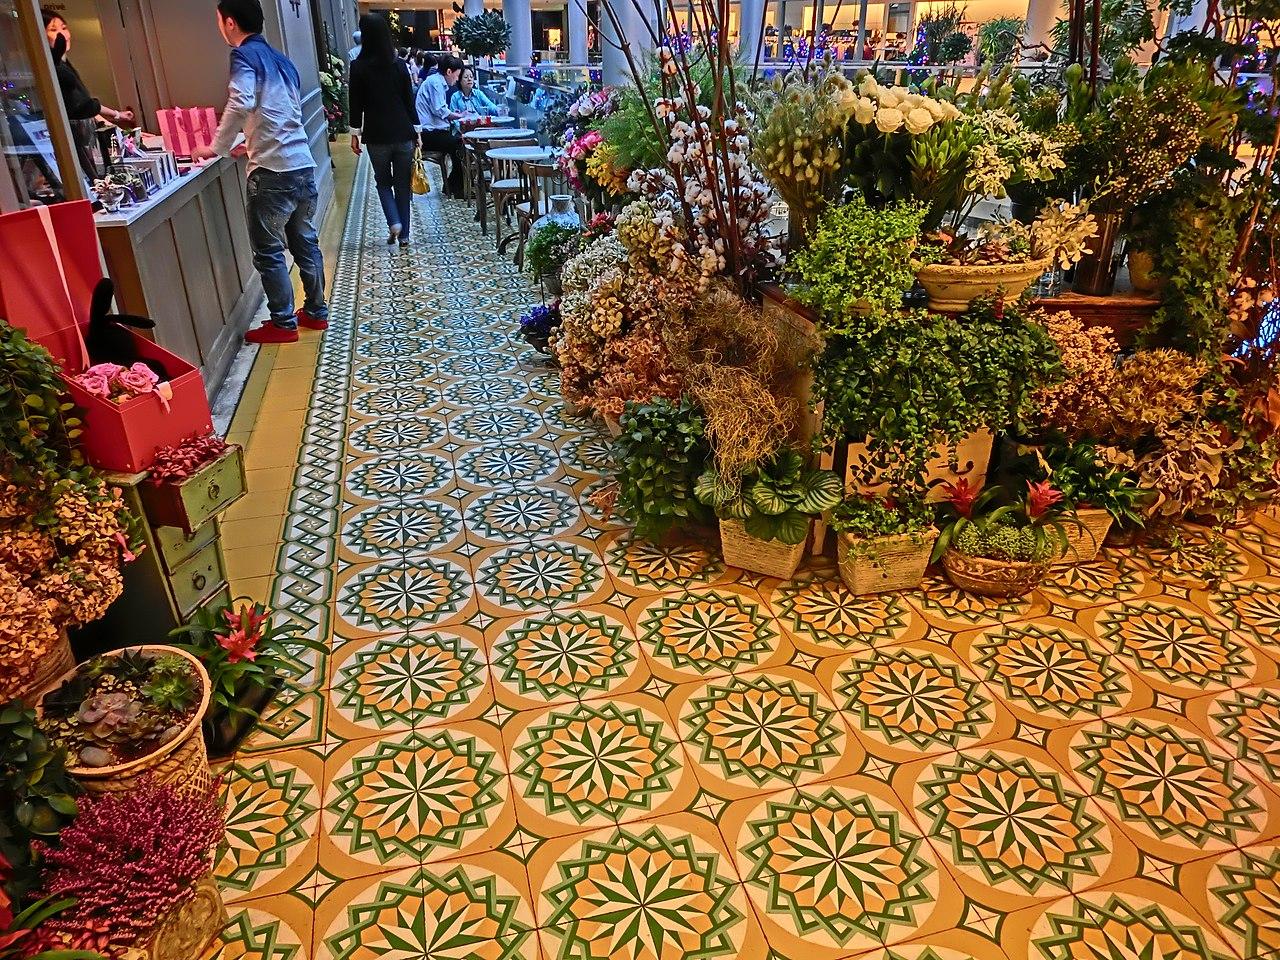 Filehk Central Ifc Mall Flower Shop Tile Flooring May 2013g